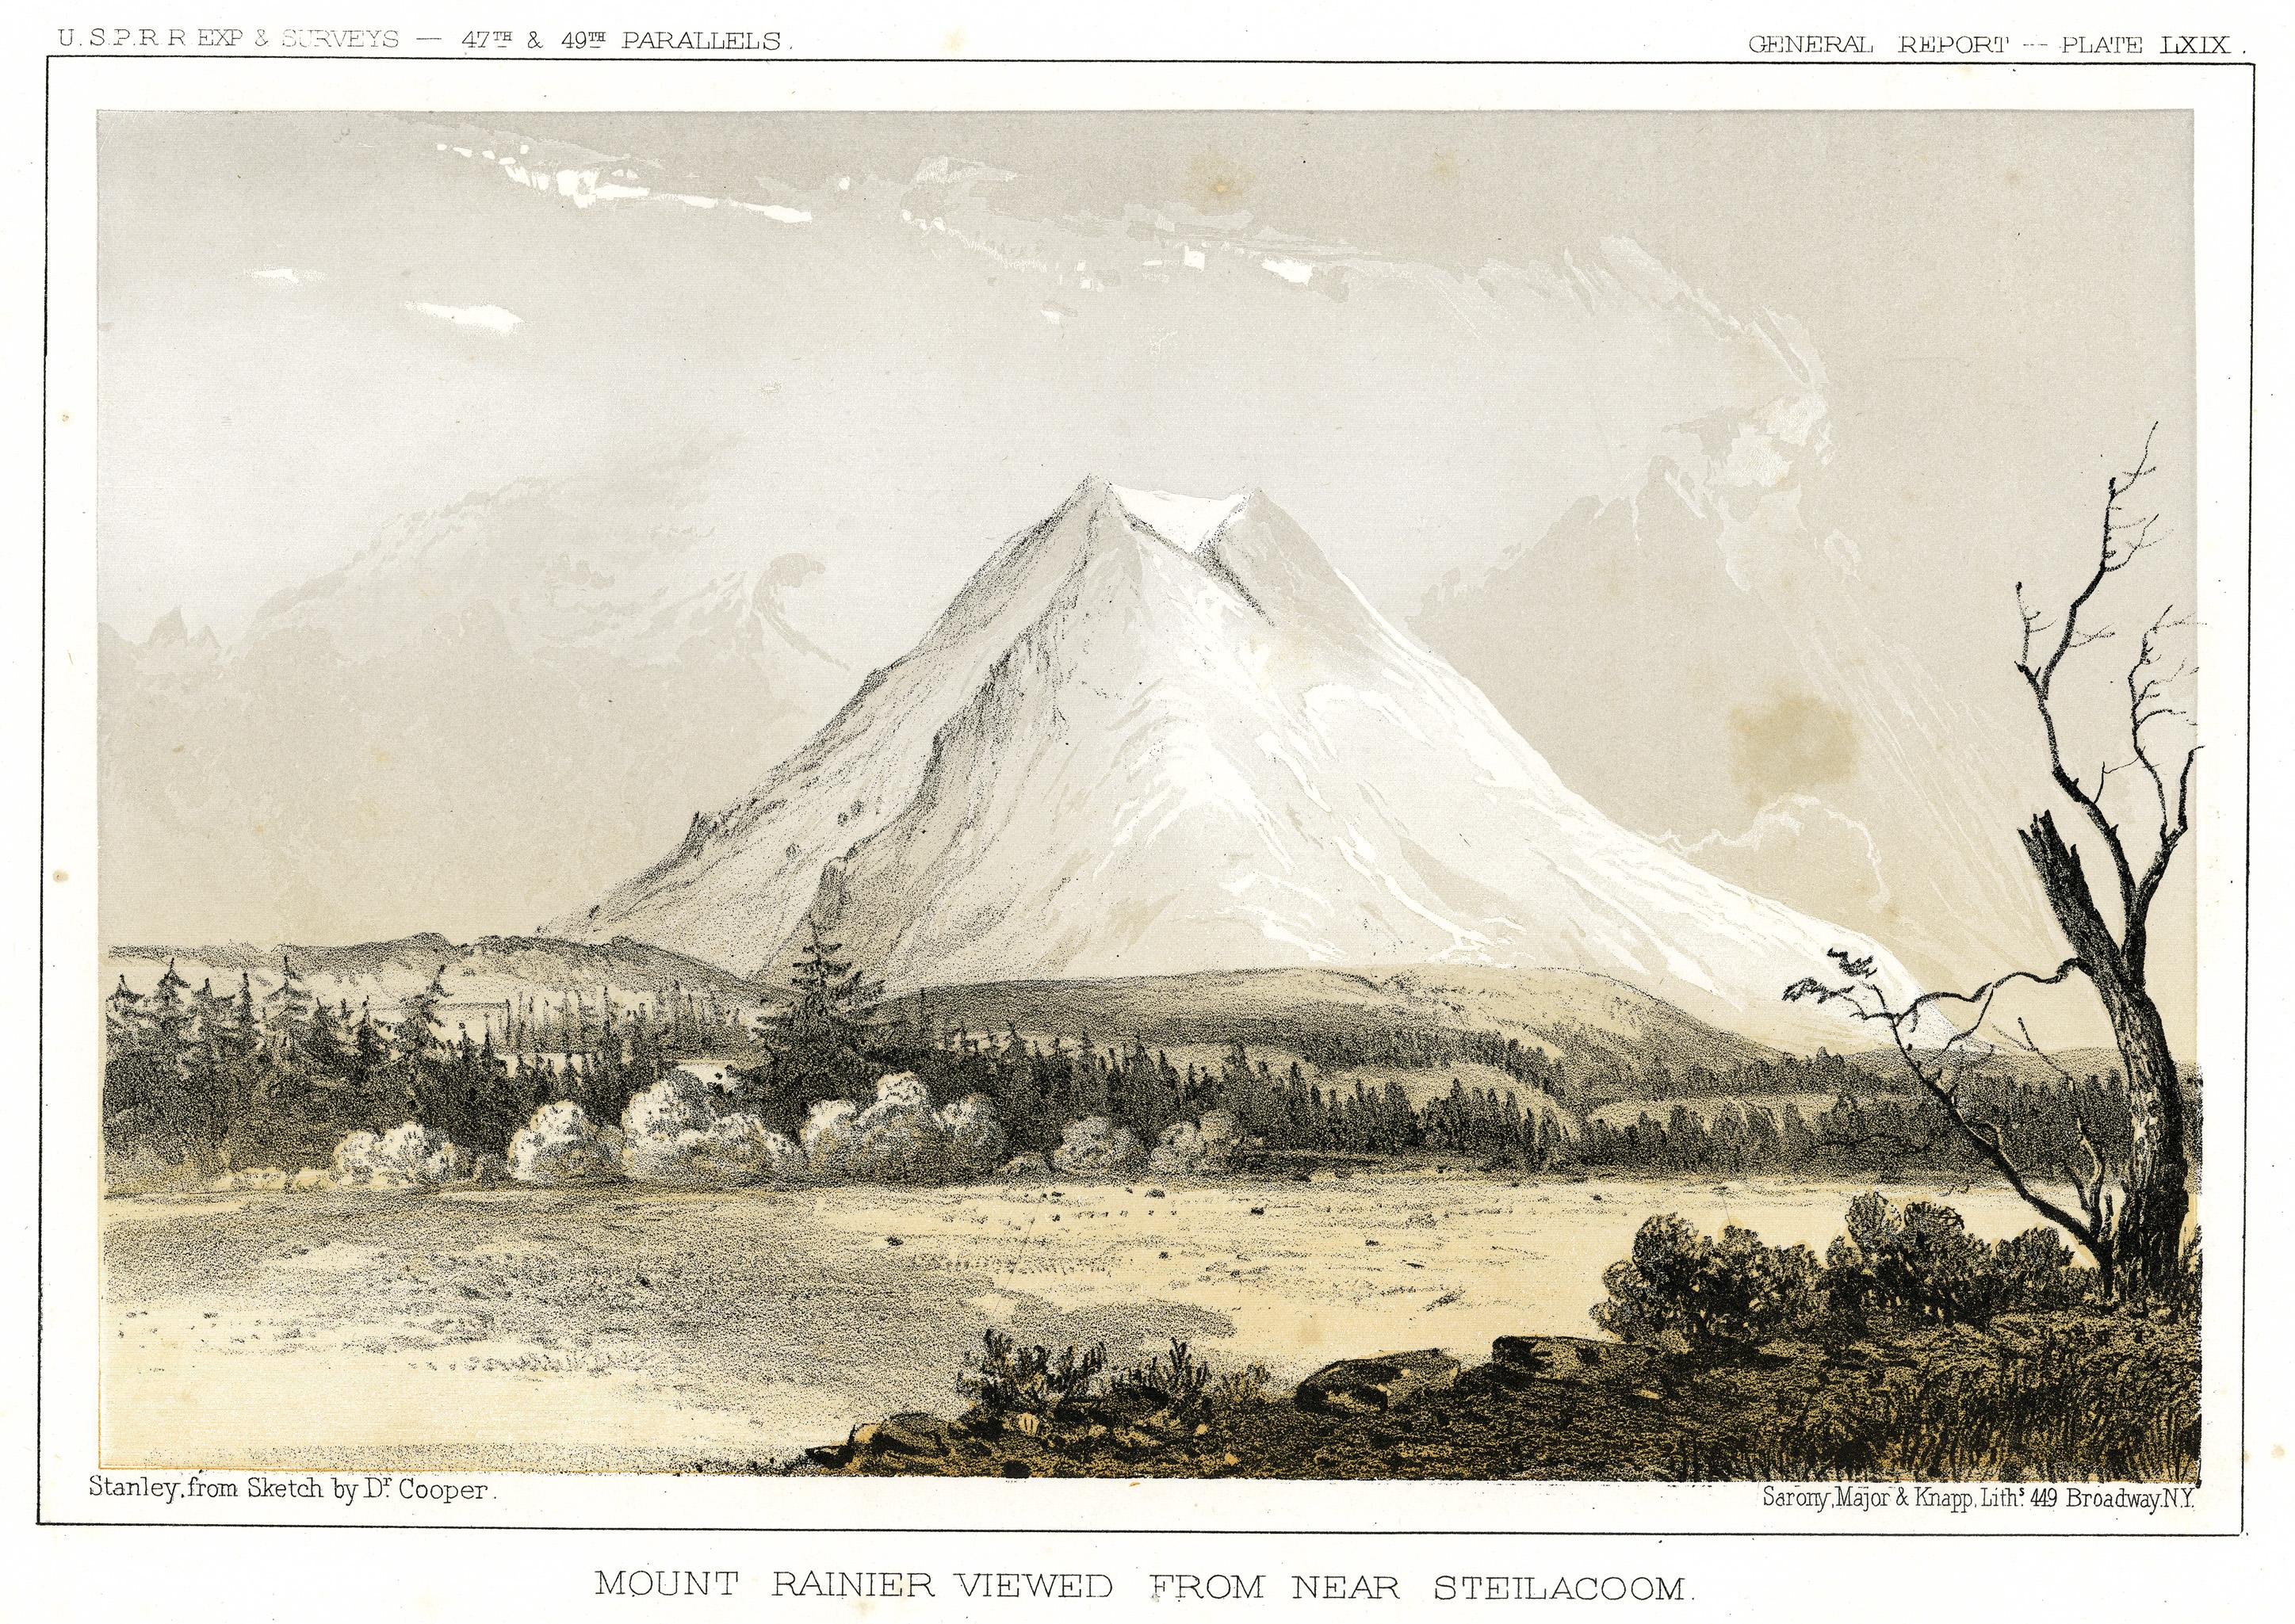 Mount Rainier Viewed From Near Steilacoom